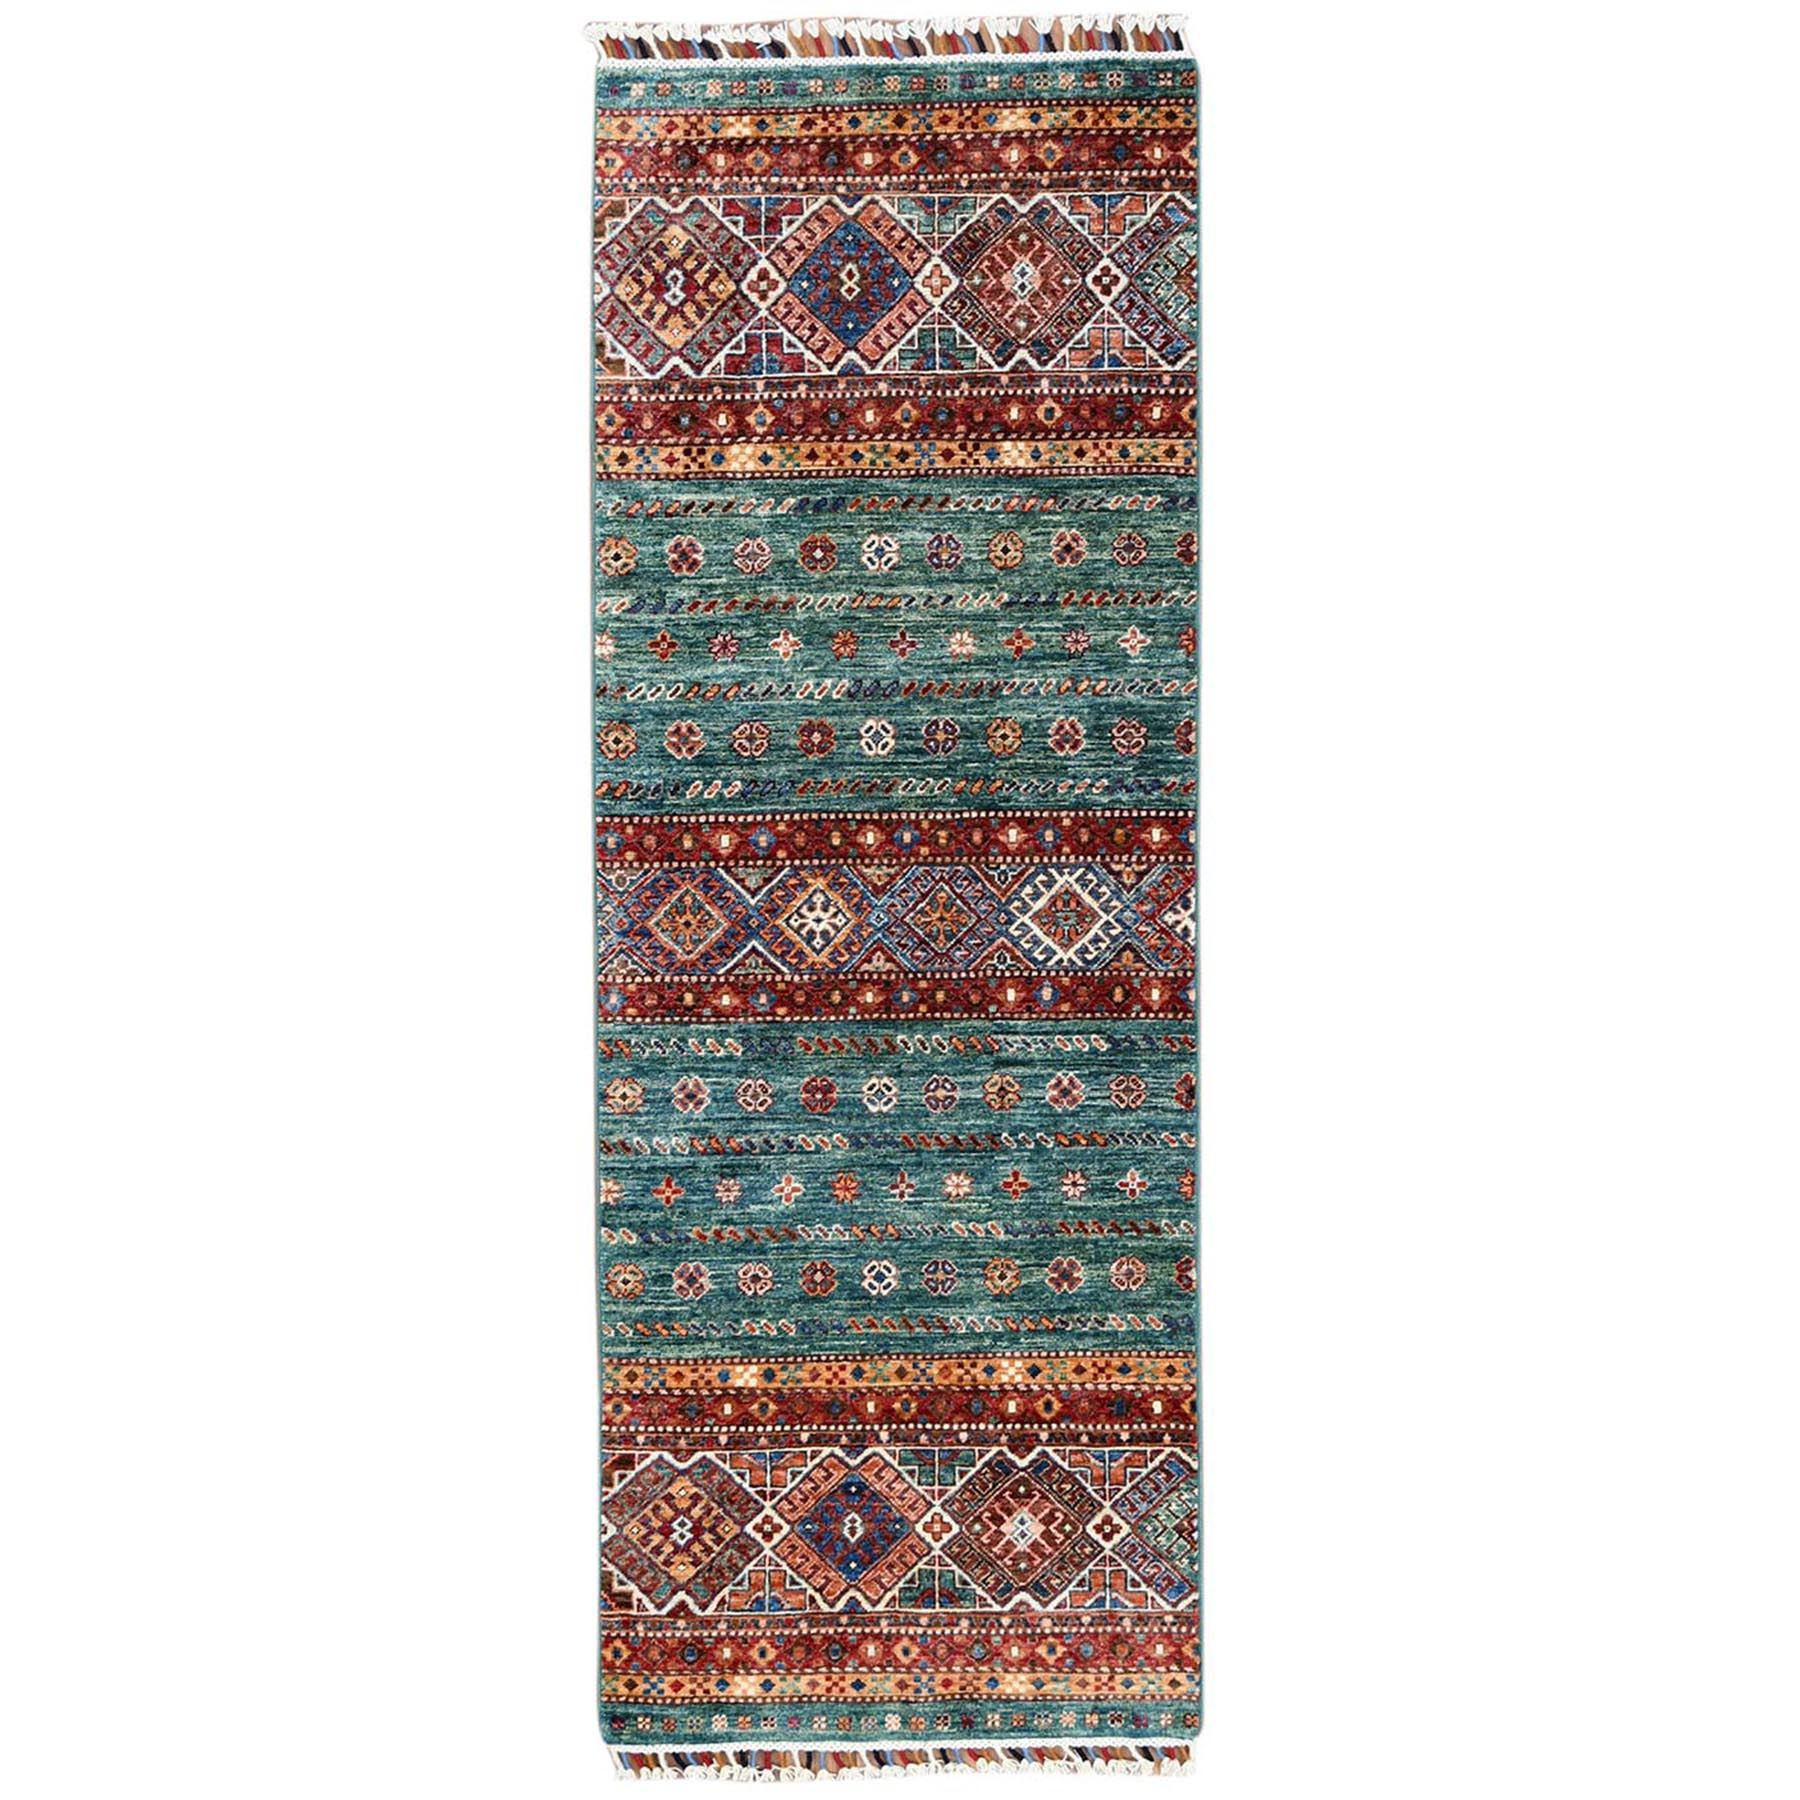 "2'6""X6'10"" Green With Colorful Tassles Hand Knotted Super Kazak Khorjin Design Organic Wool Oriental Runner Rug moa60ba9"